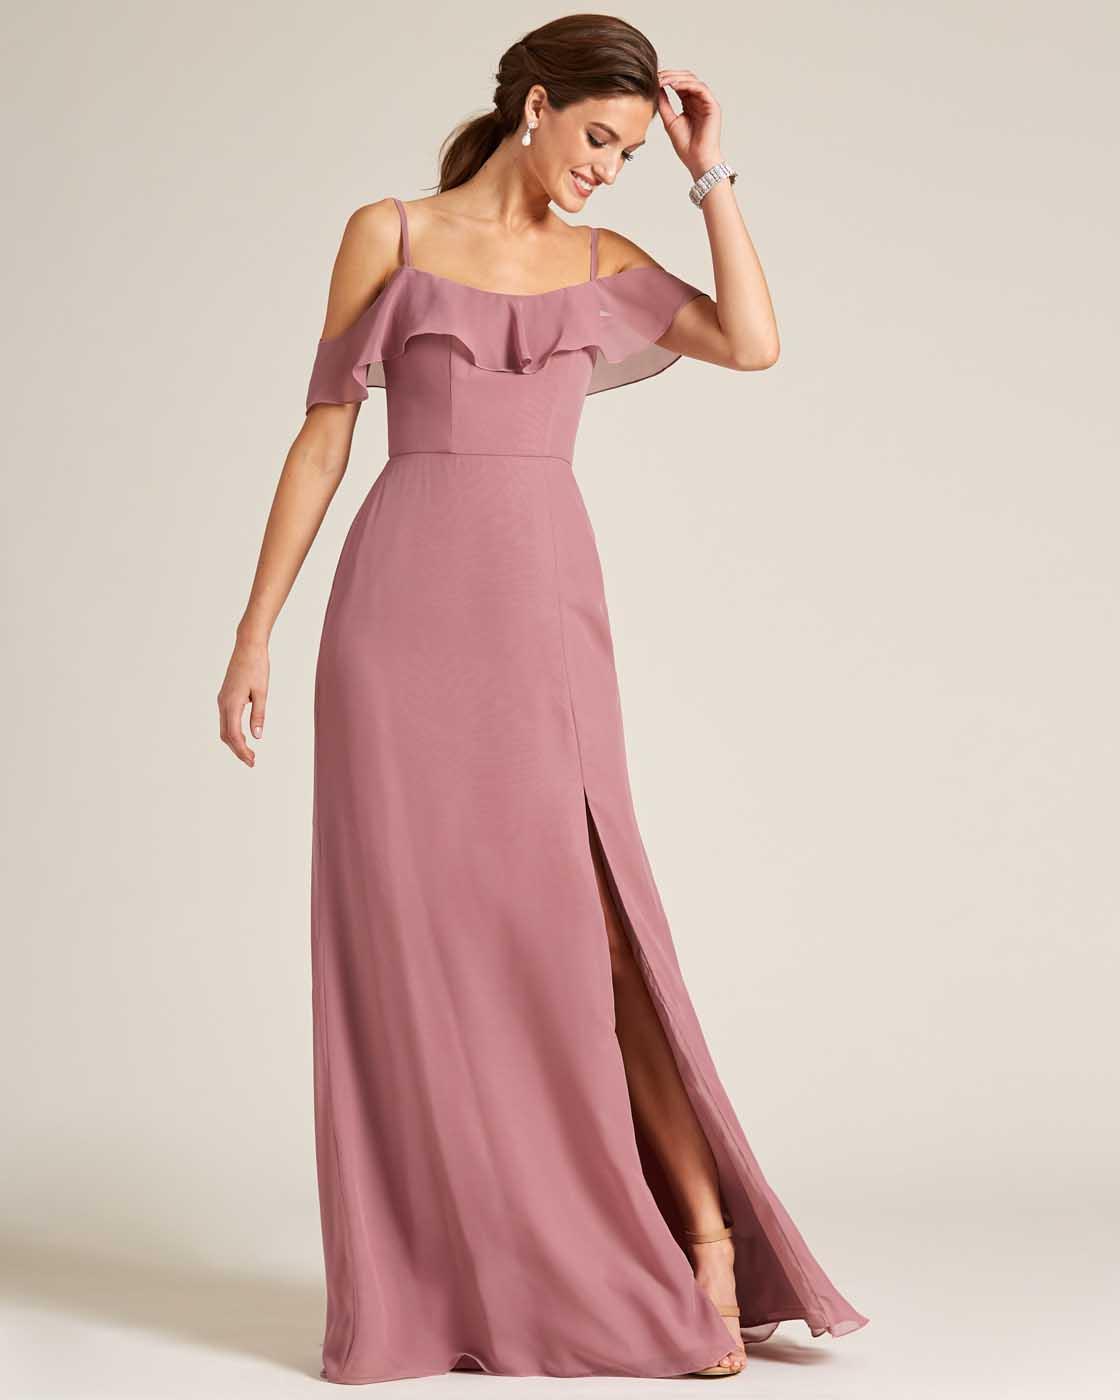 Rose Pink Layered Top Long Slit Skirt Dress - Front